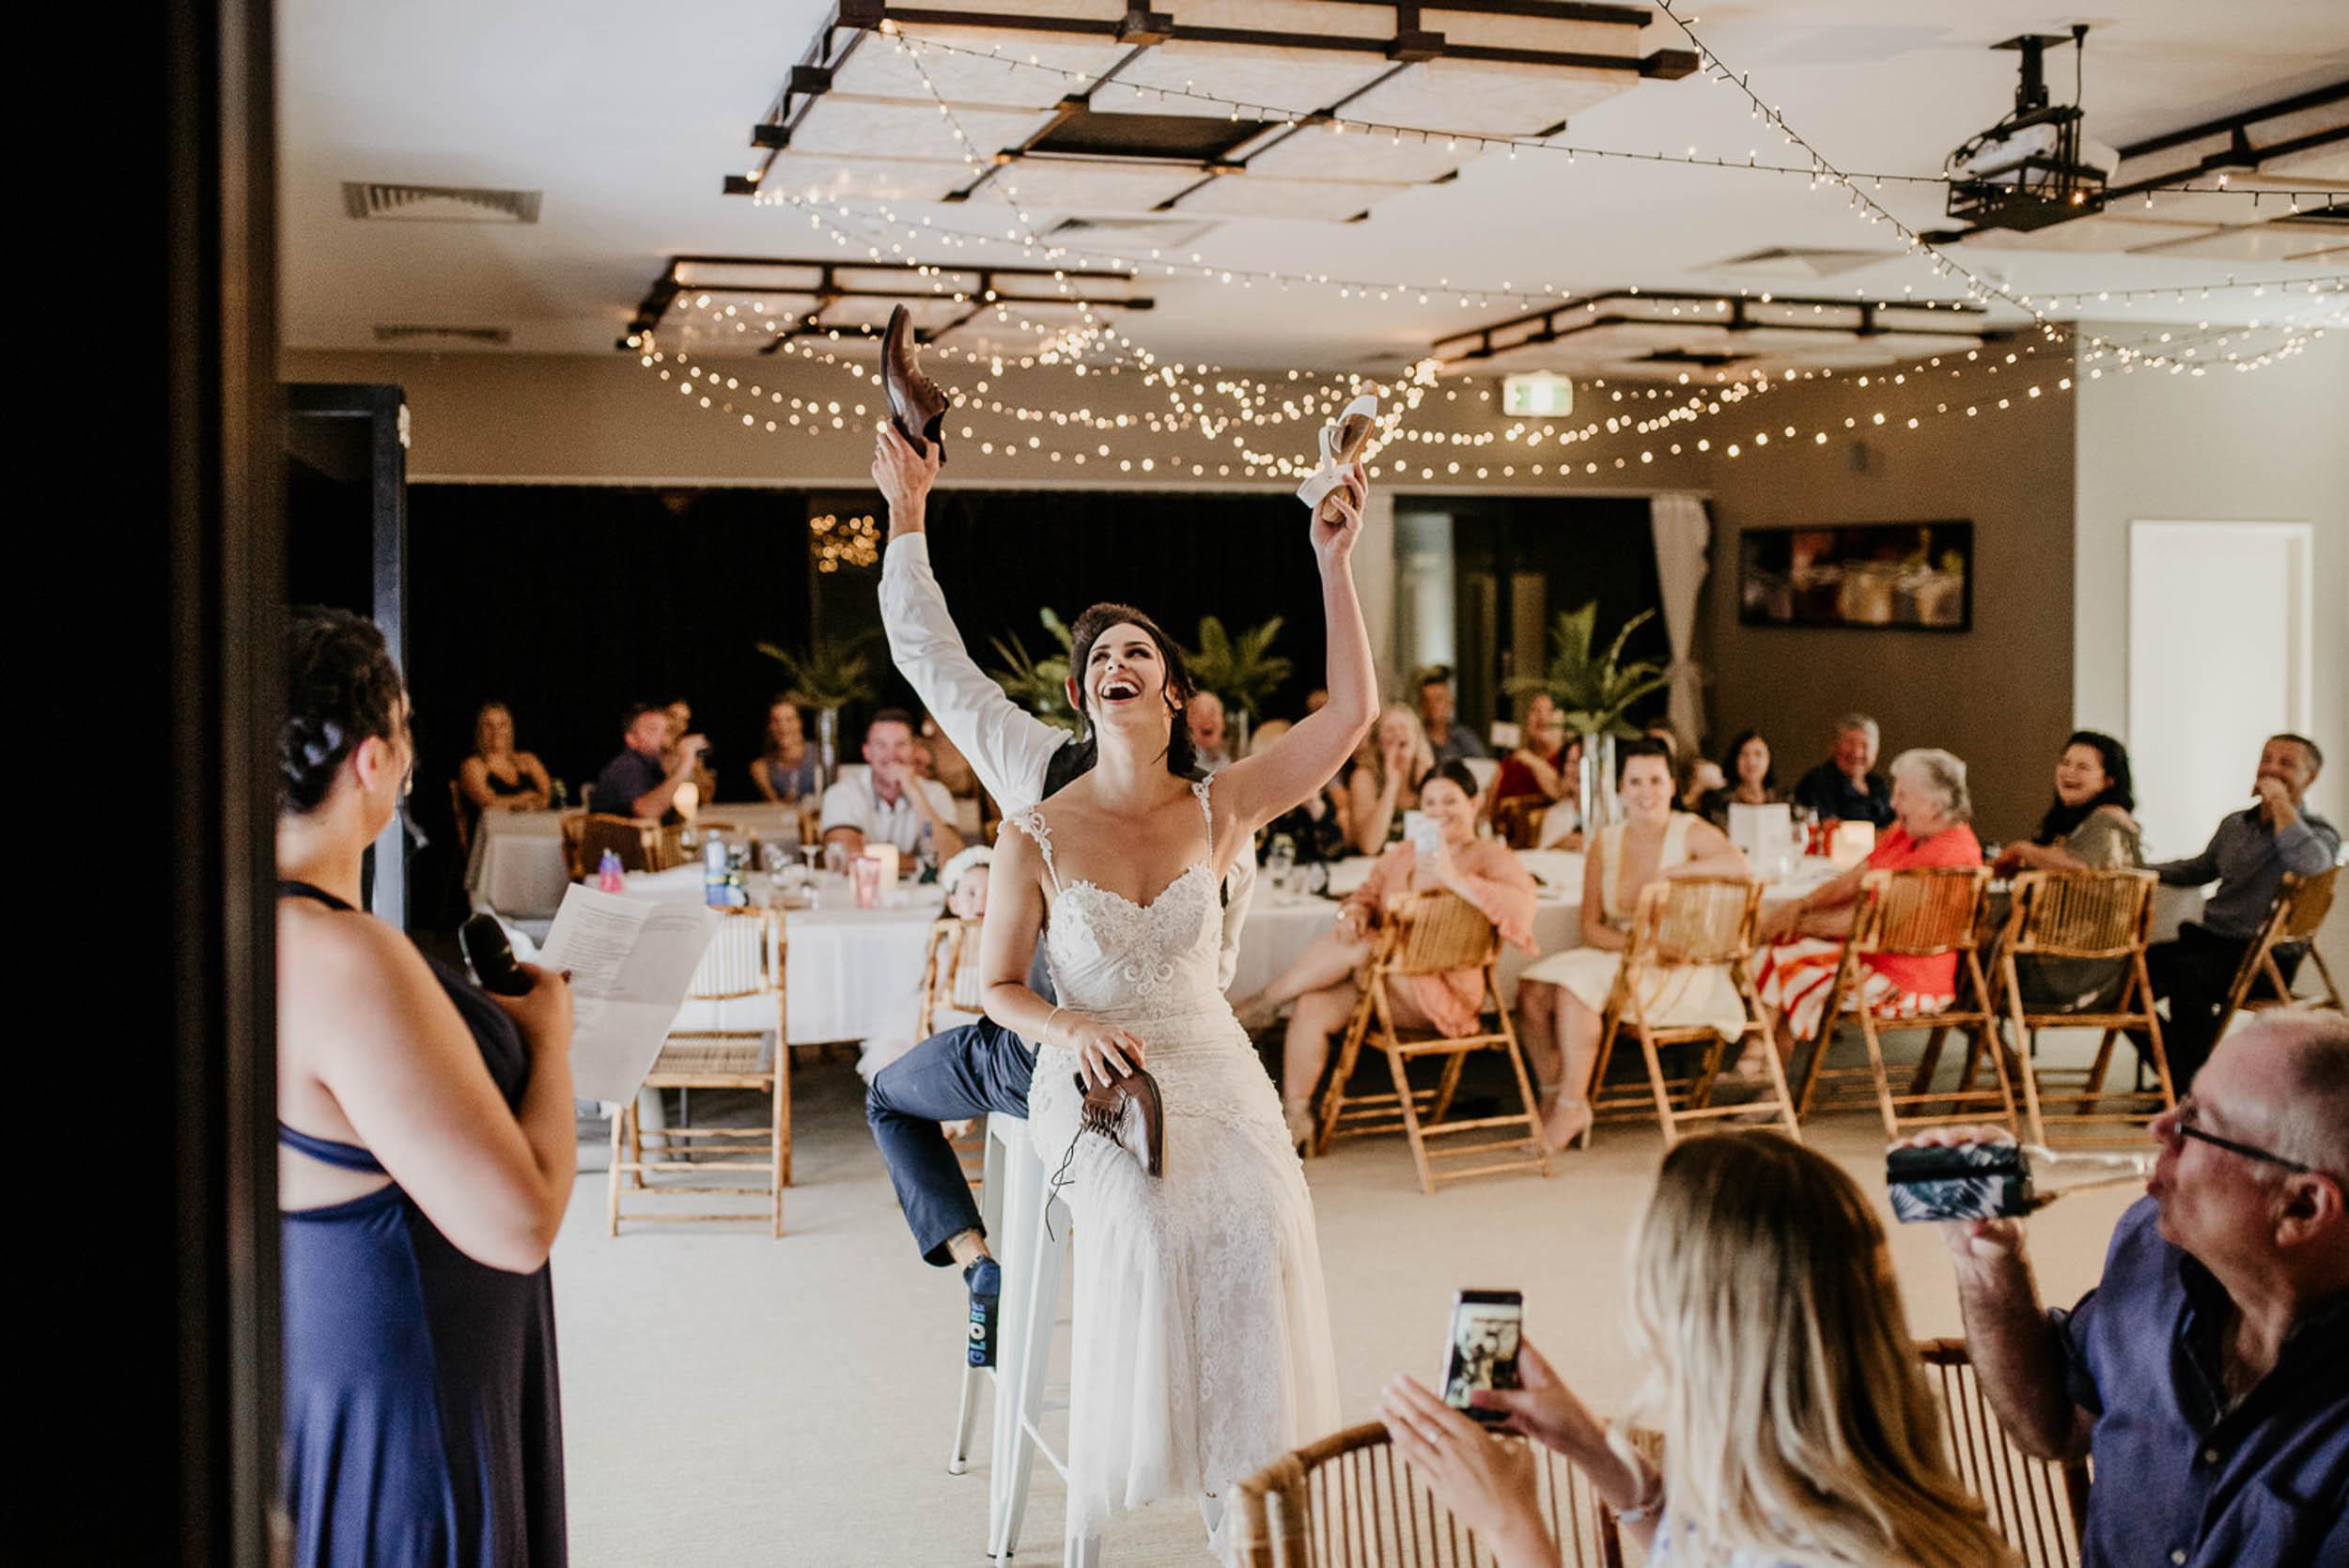 The Raw Photographer - Cairns Wedding Photographer - Fitzroy Island - Destination Wedding - Bride Dress - Groom Portrait - Queensland-45.jpg